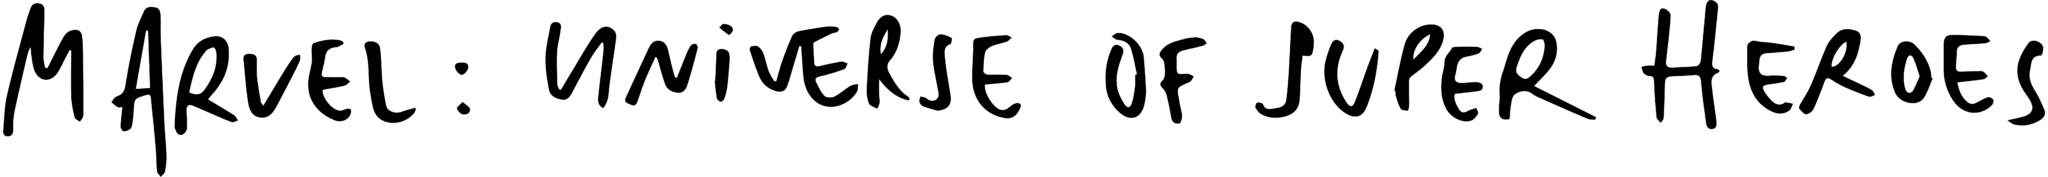 marvel-02